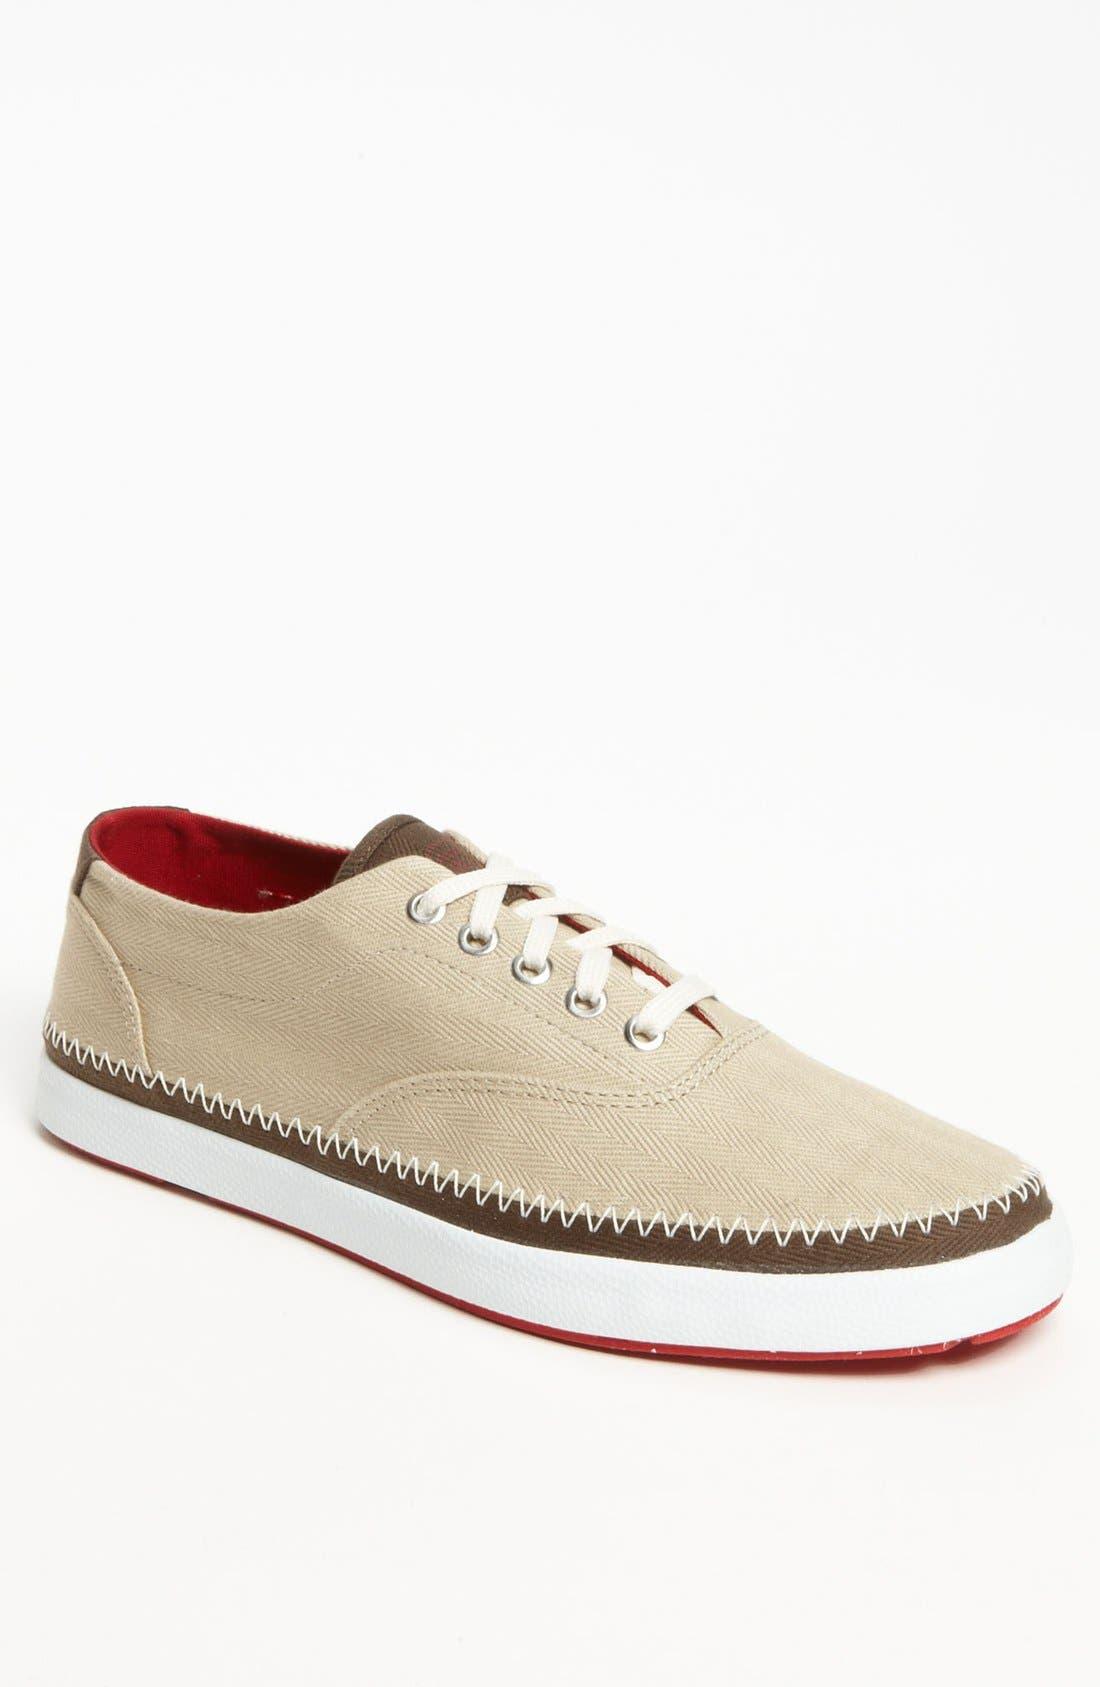 Alternate Image 1 Selected - Sperry Top-Sider® 'Drifter CVO' Sneaker (Men)